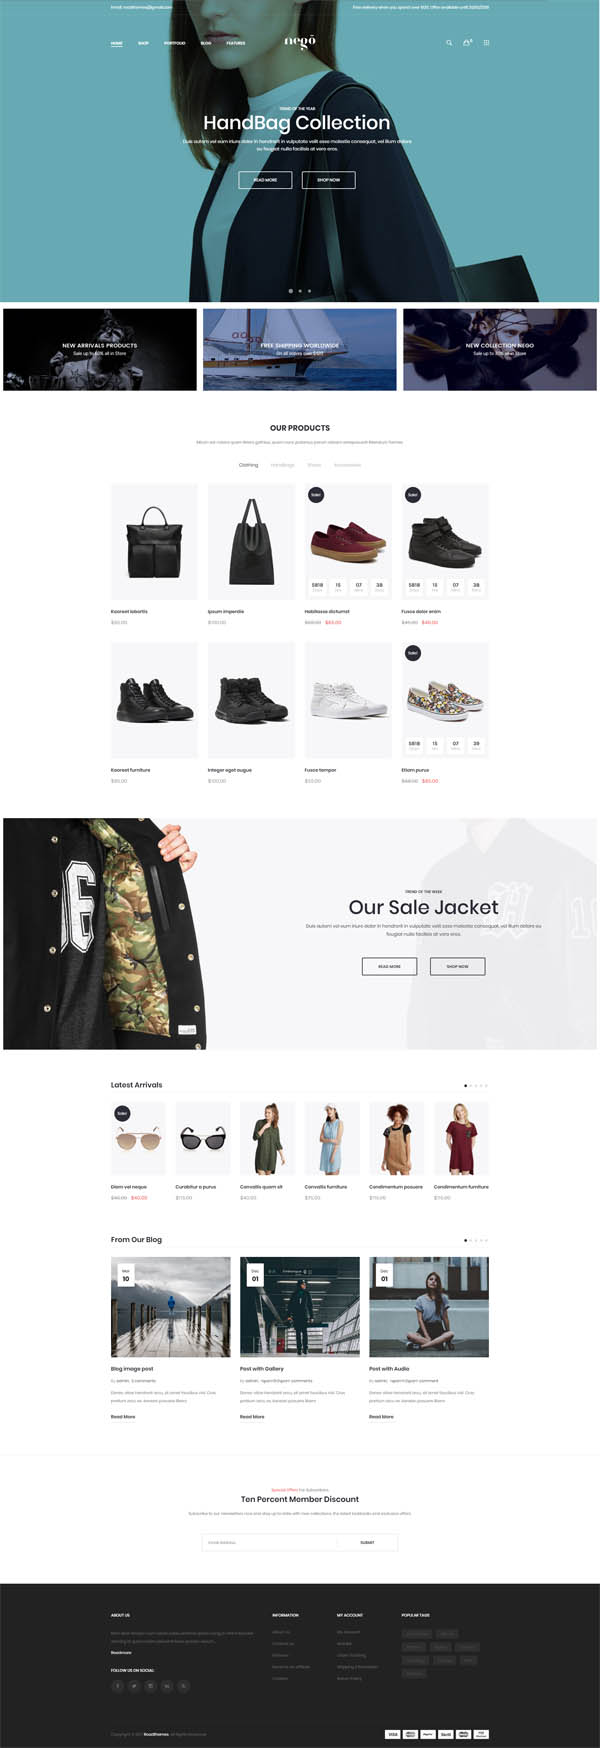 Nego - Fashion and Furniture Theme for WooCommerce WordPress